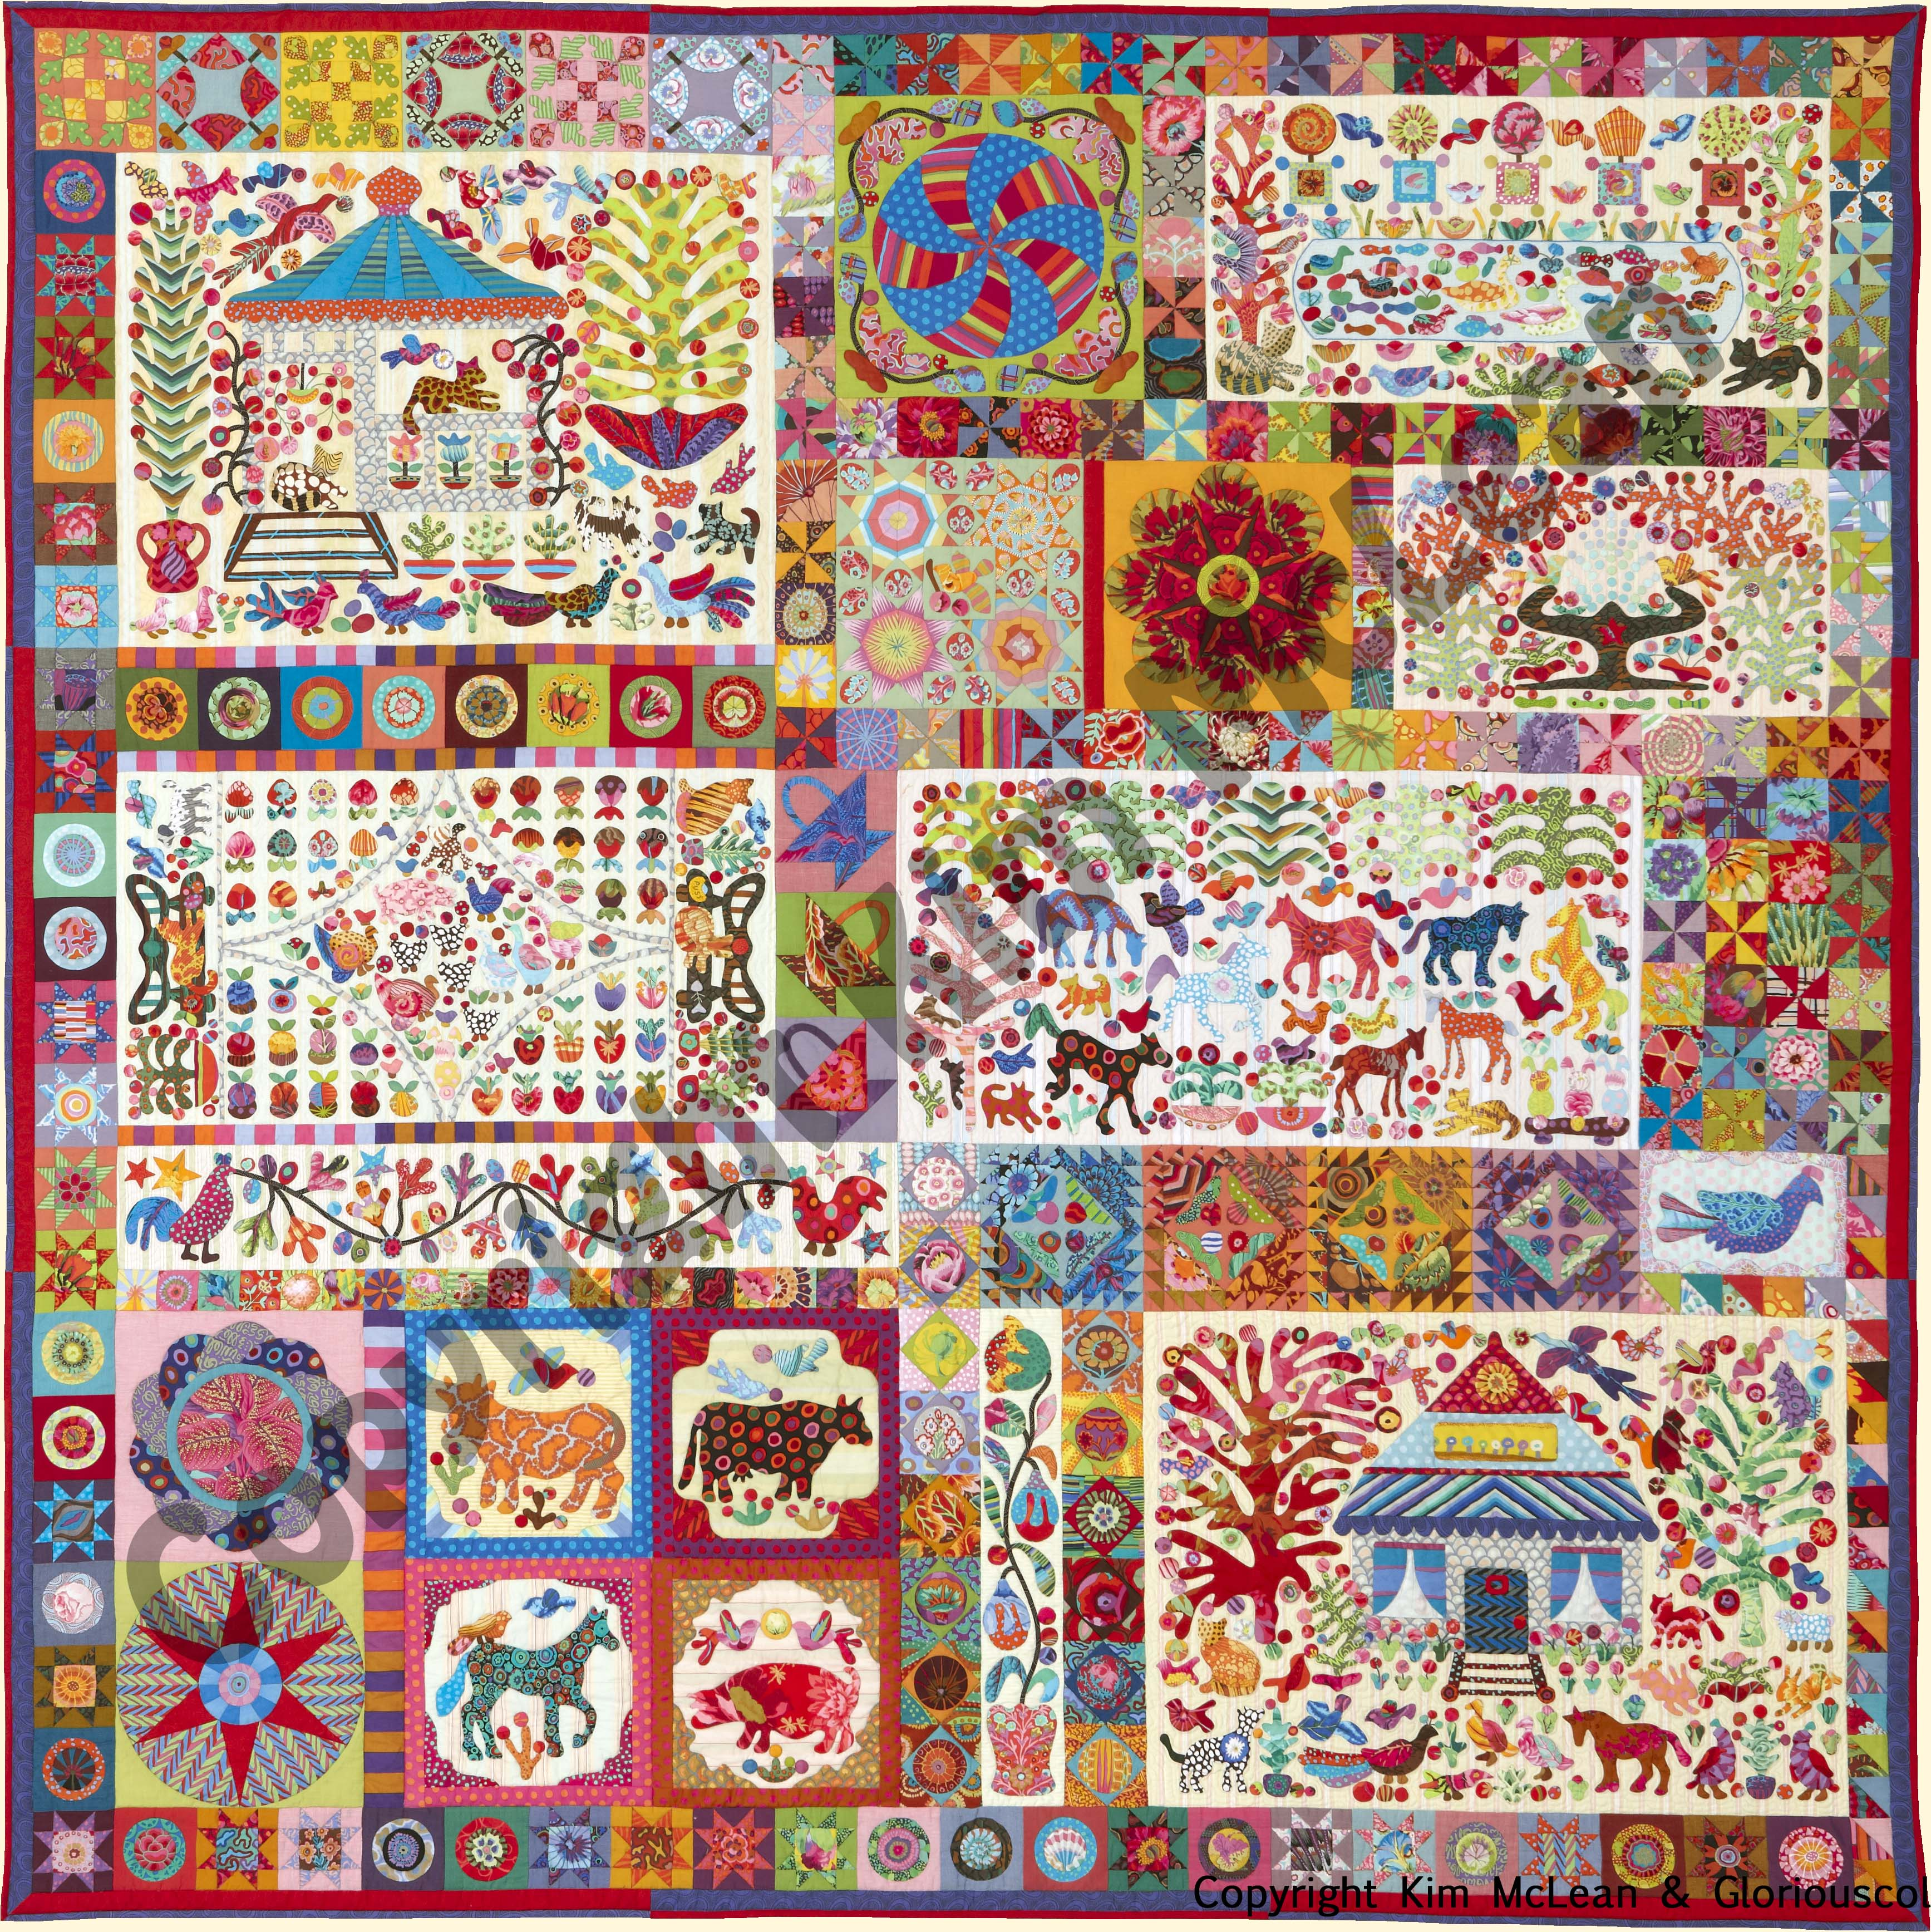 Pandemonium from Glorious Color. Kaffe Fassett Collective fabrics ... : kim mclean quilts - Adamdwight.com